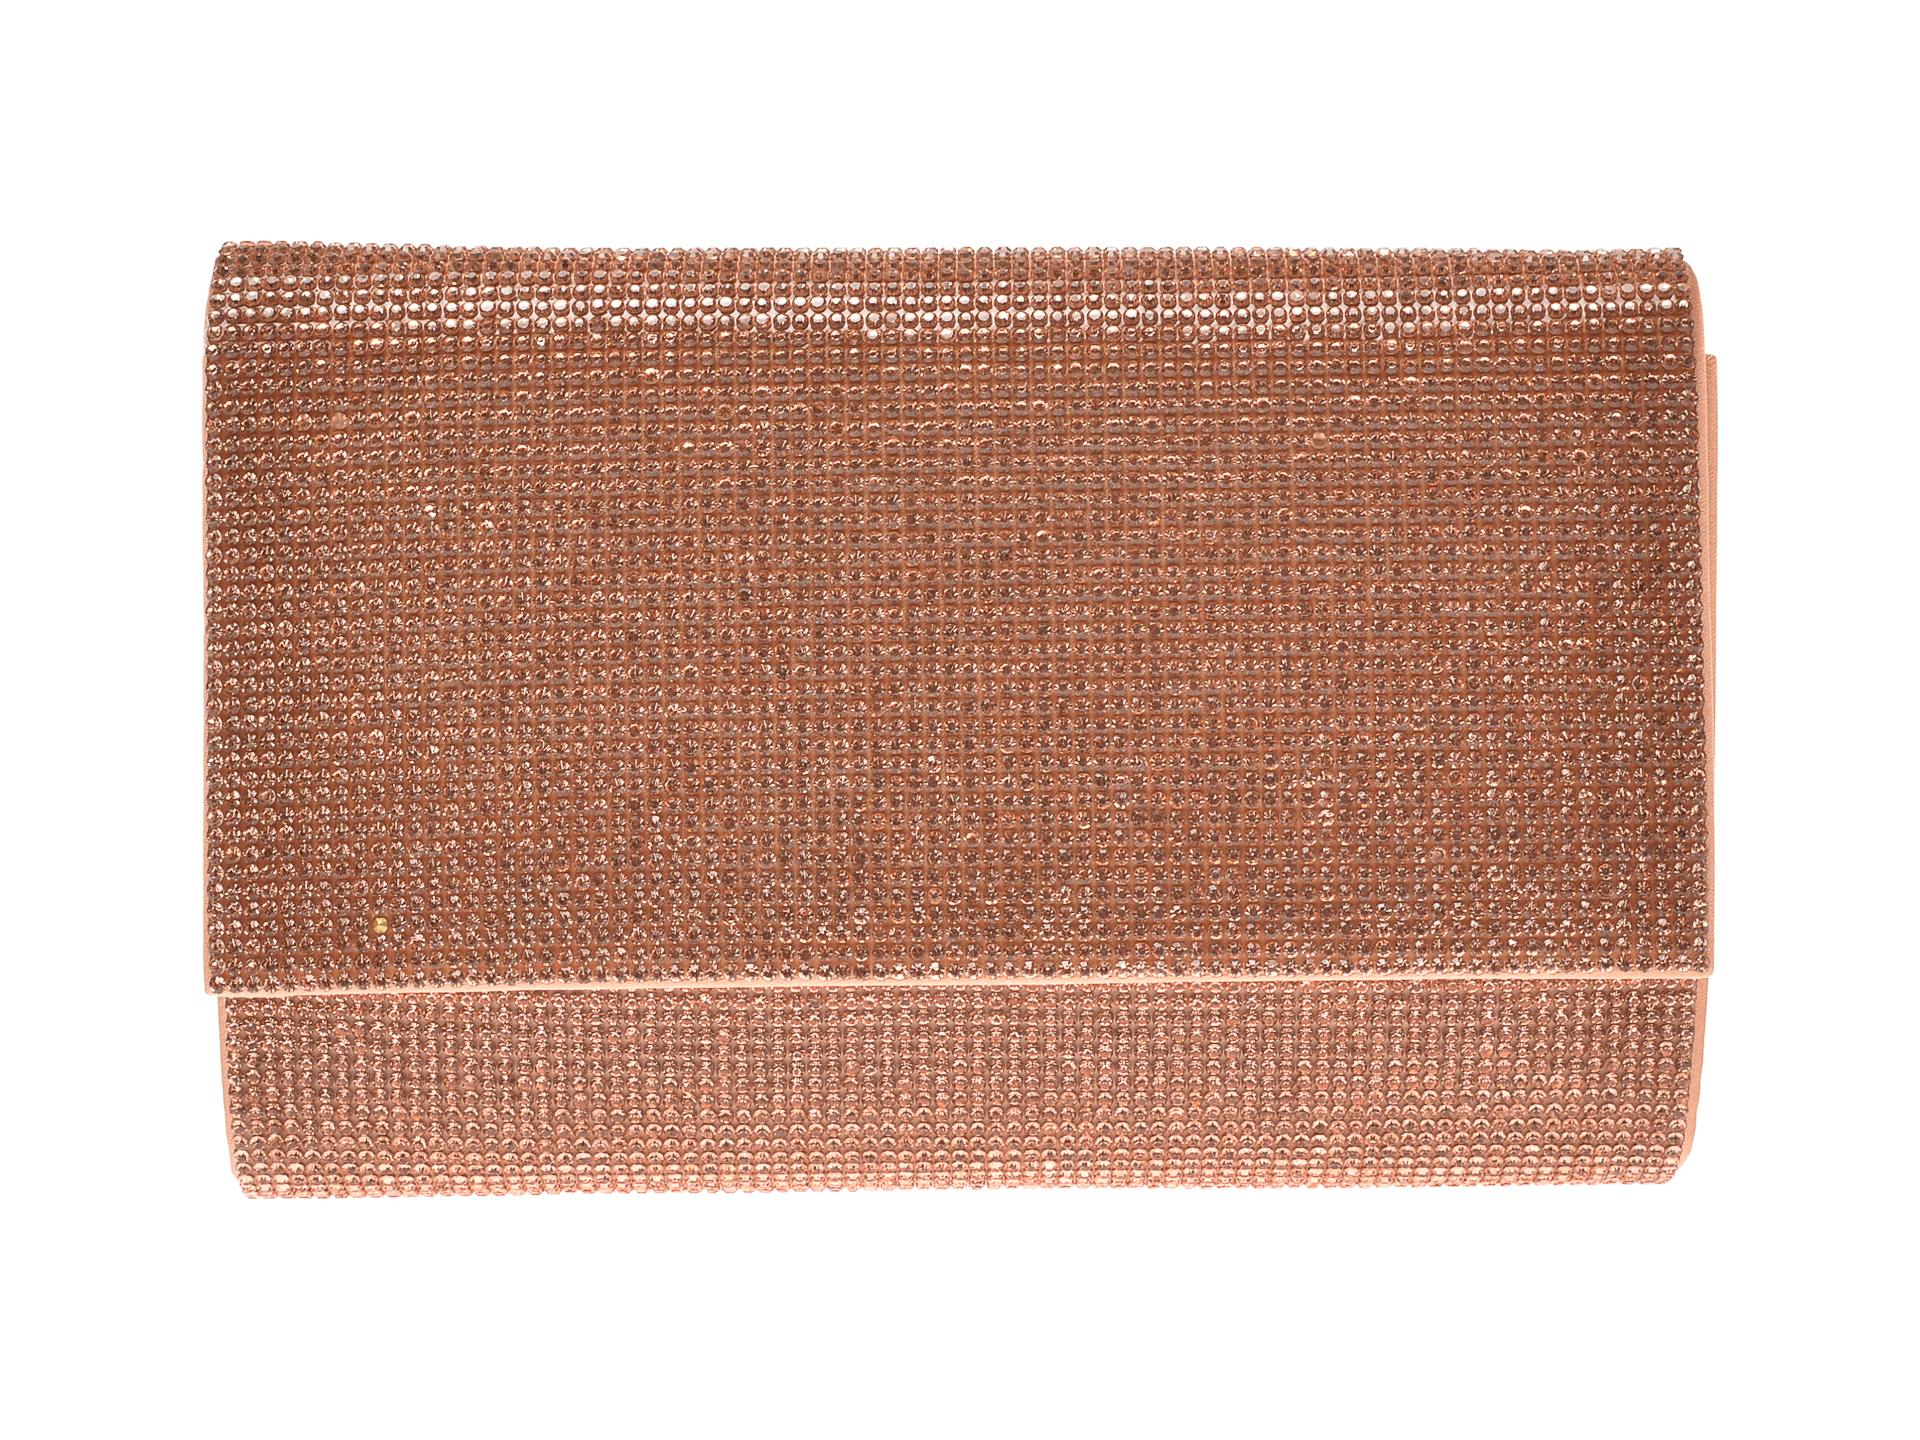 Poseta plic ALDO aurie, Imnaha650, din material textil imagine otter.ro